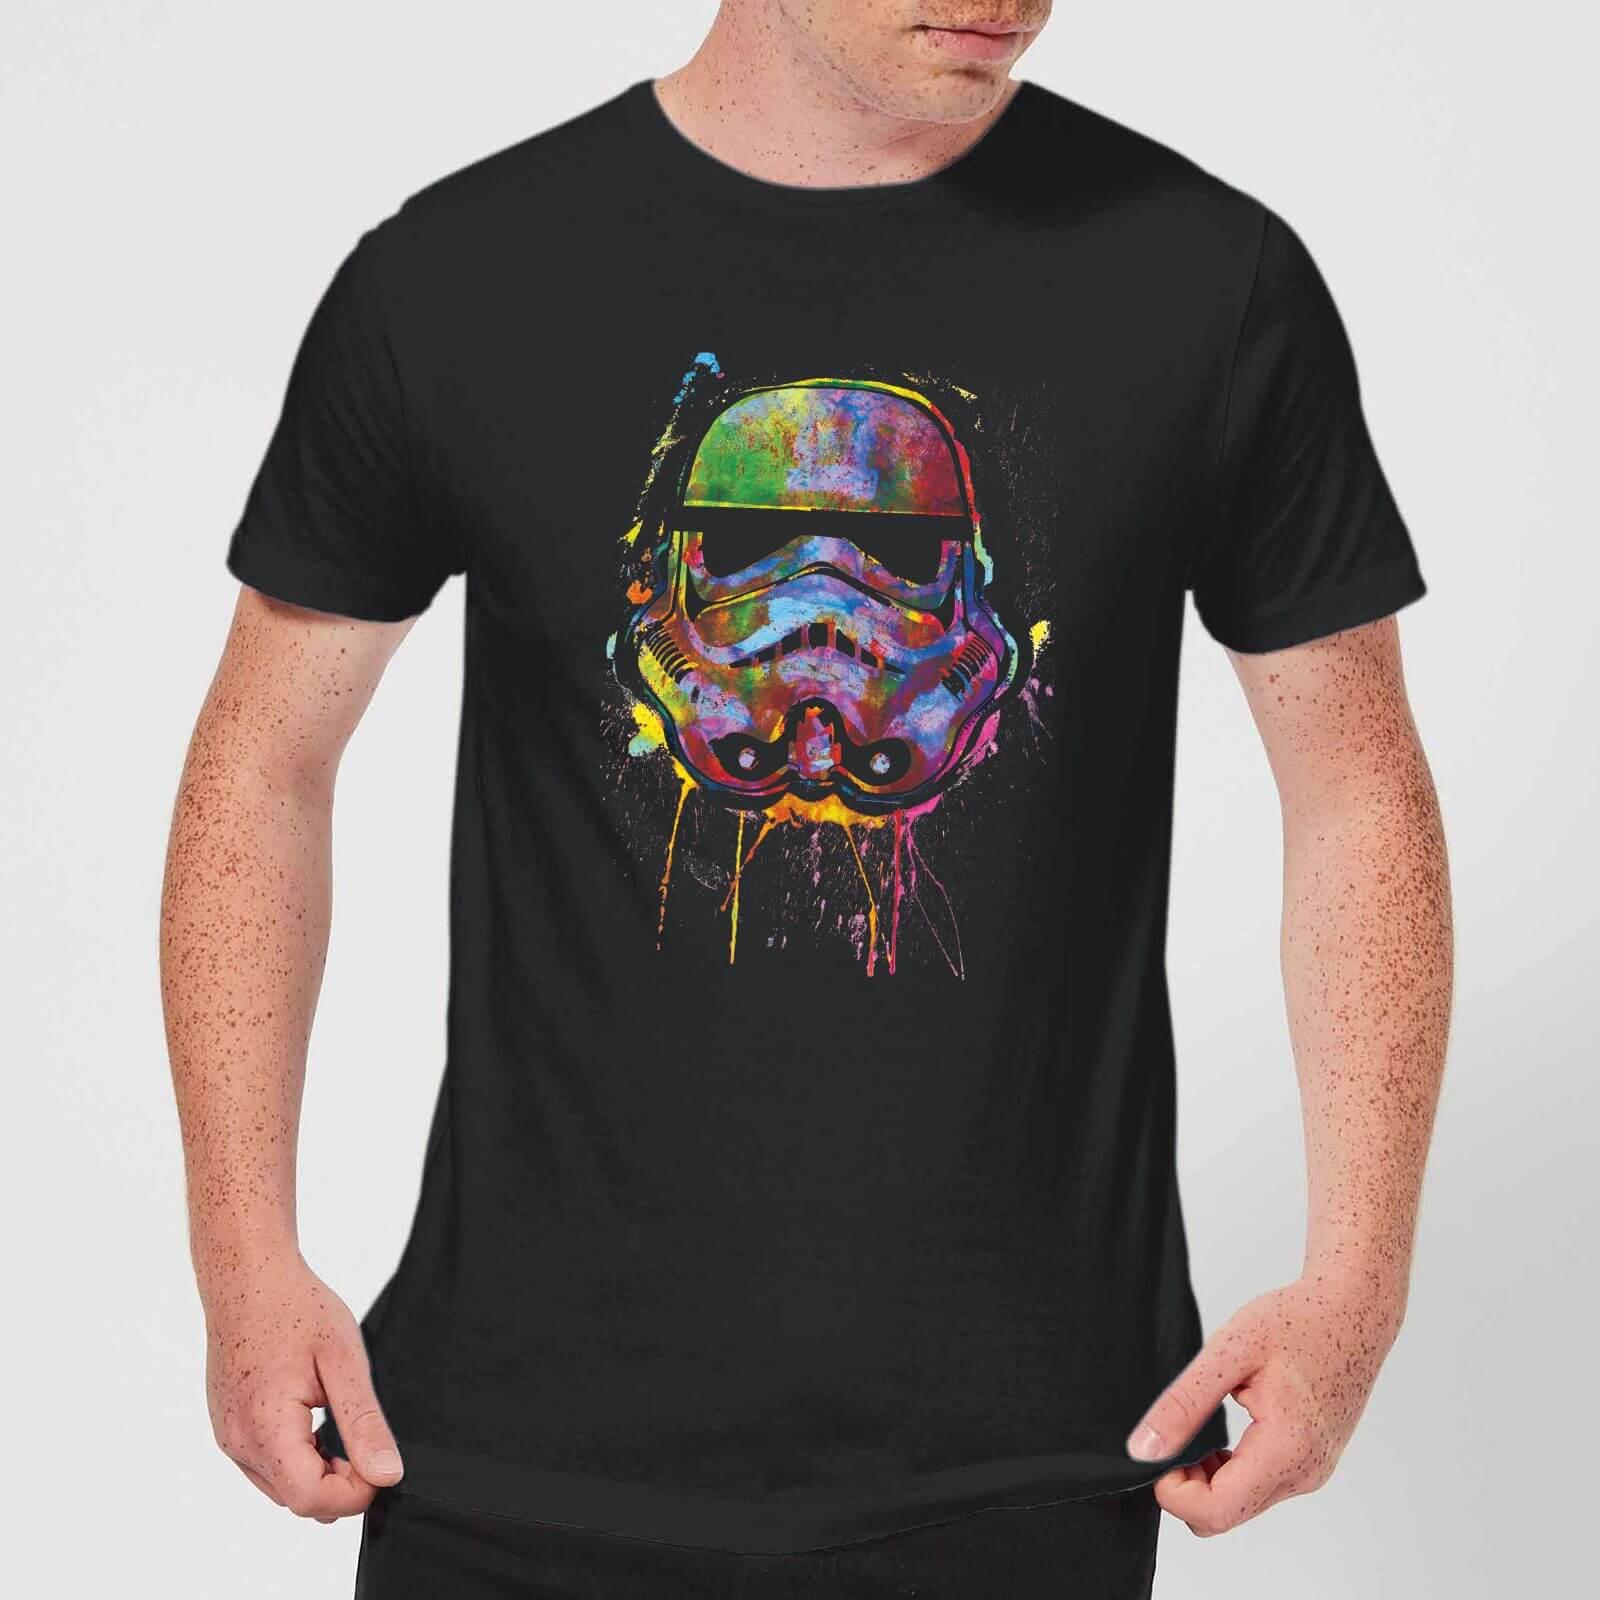 20% de descuento en Camisetas frikis